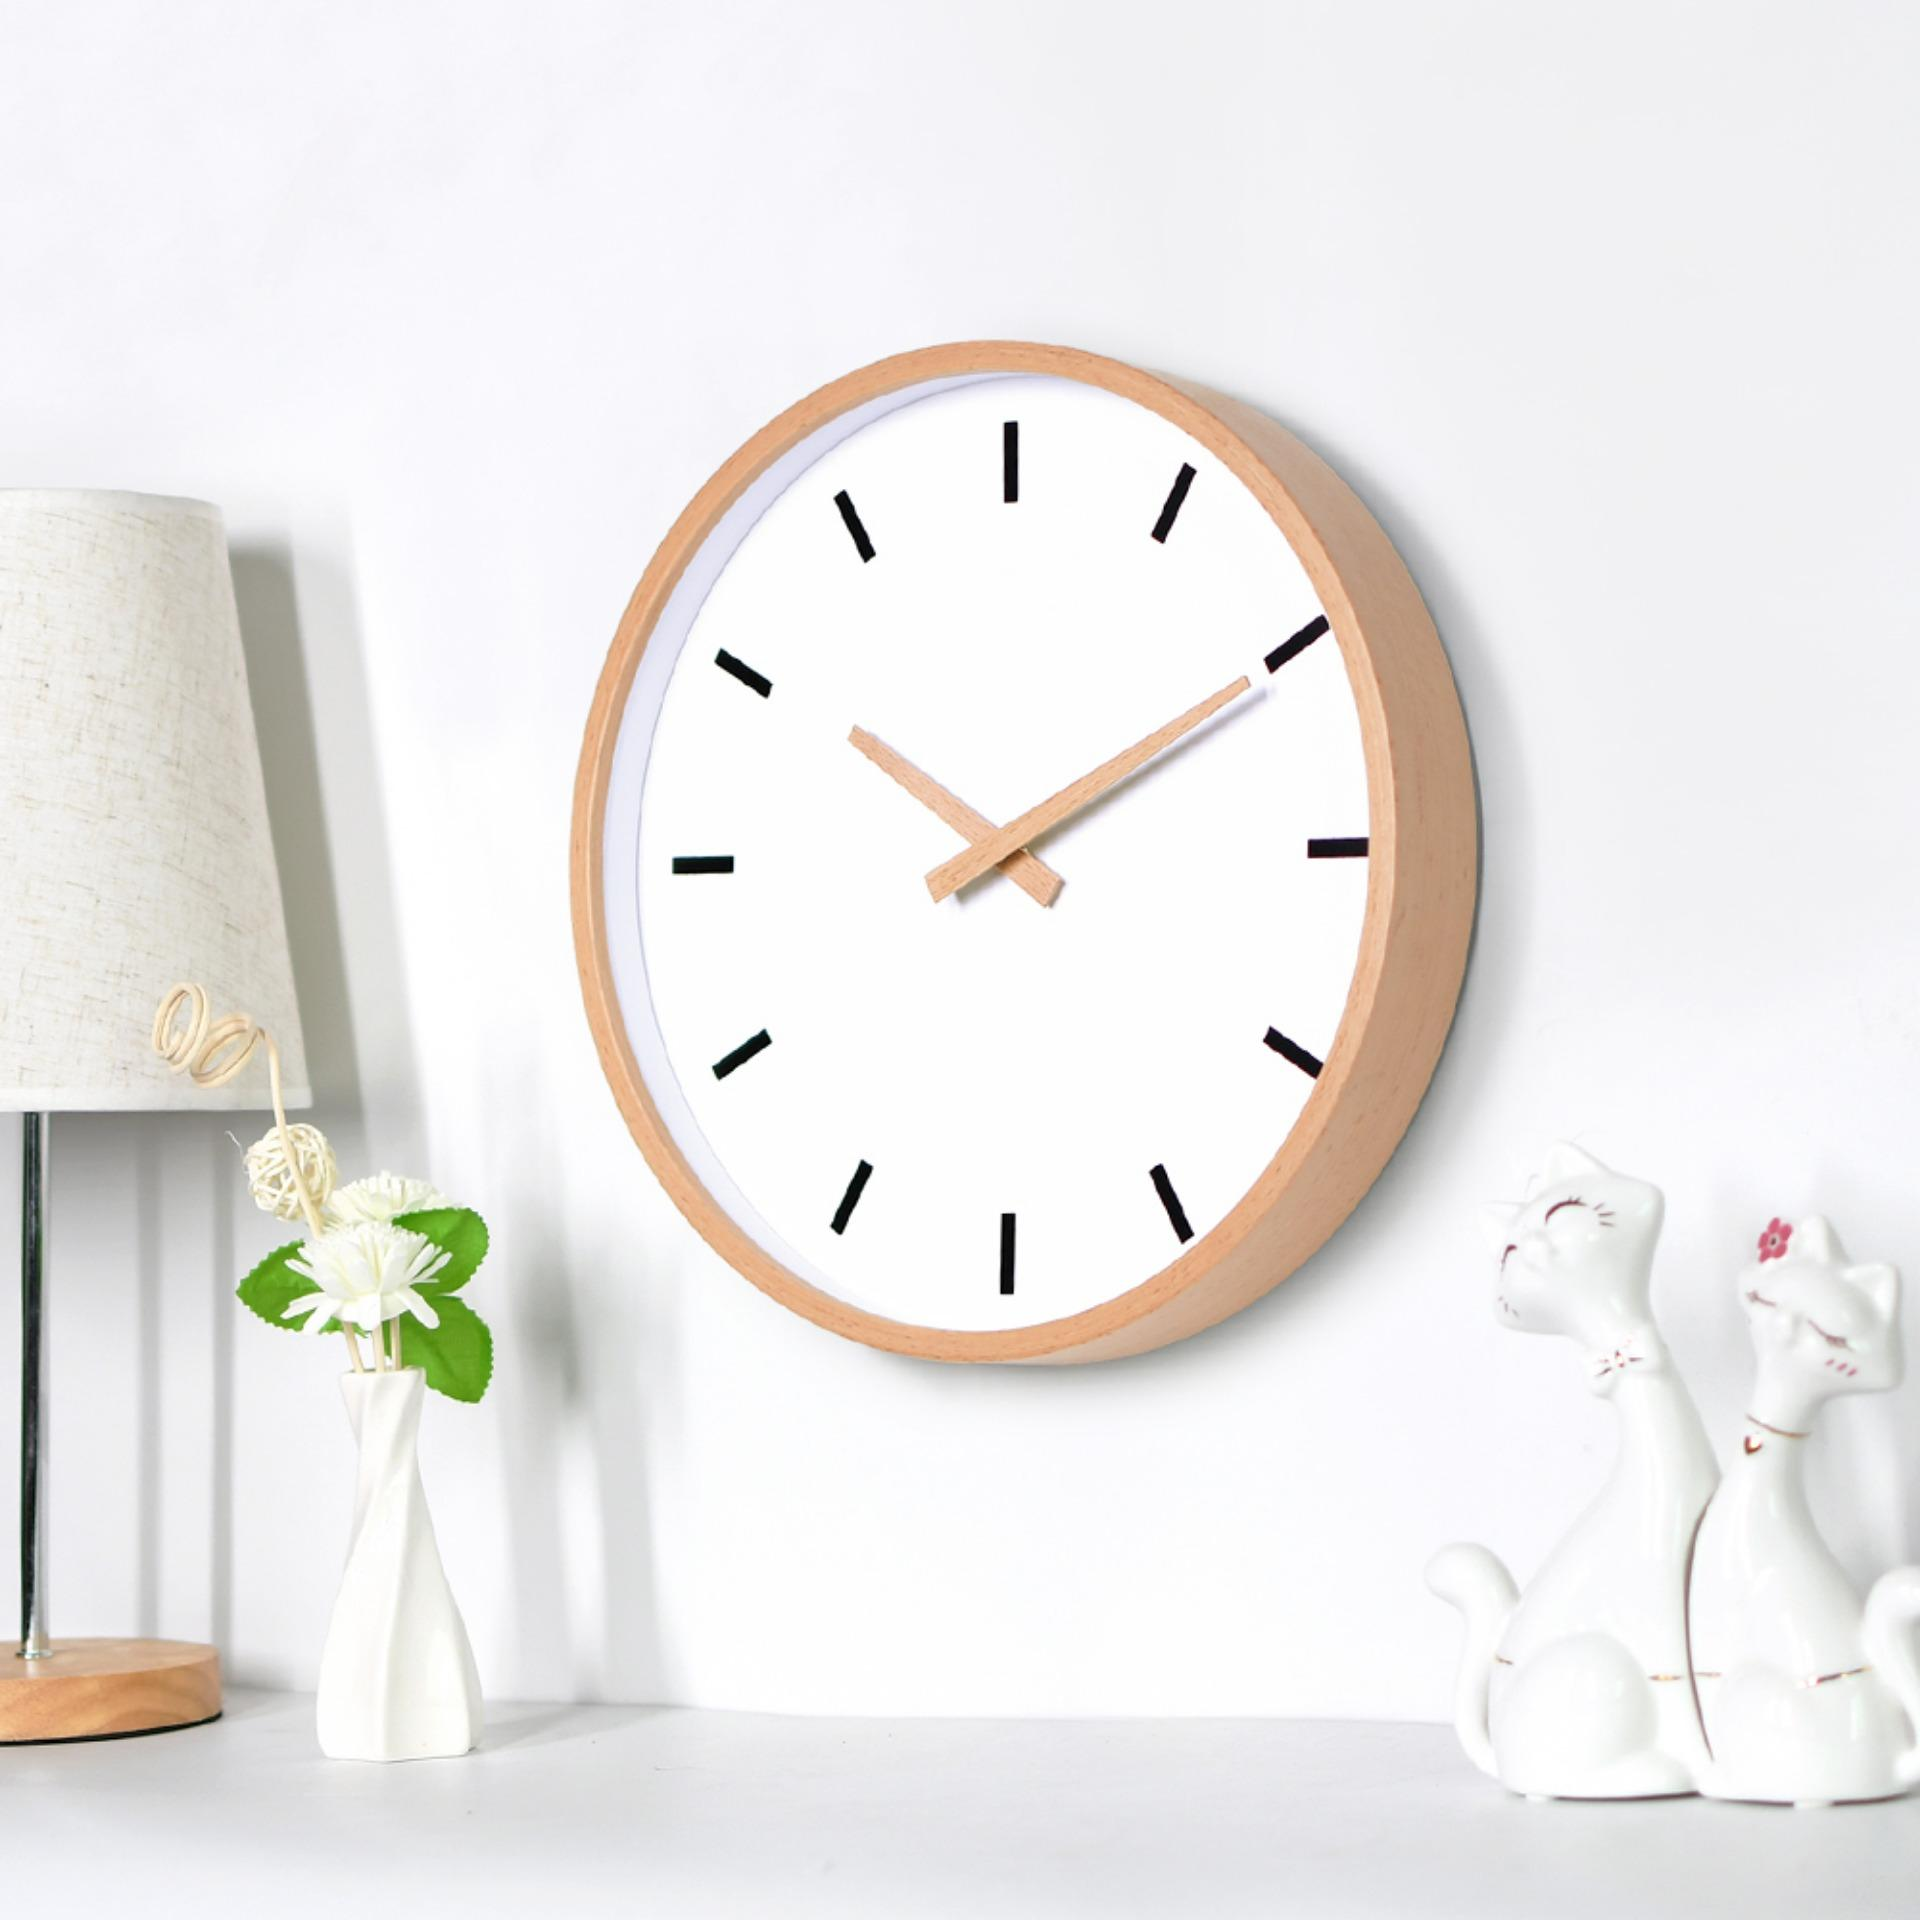 Wood Wall Clock Decorative Wall Clock 14 ...